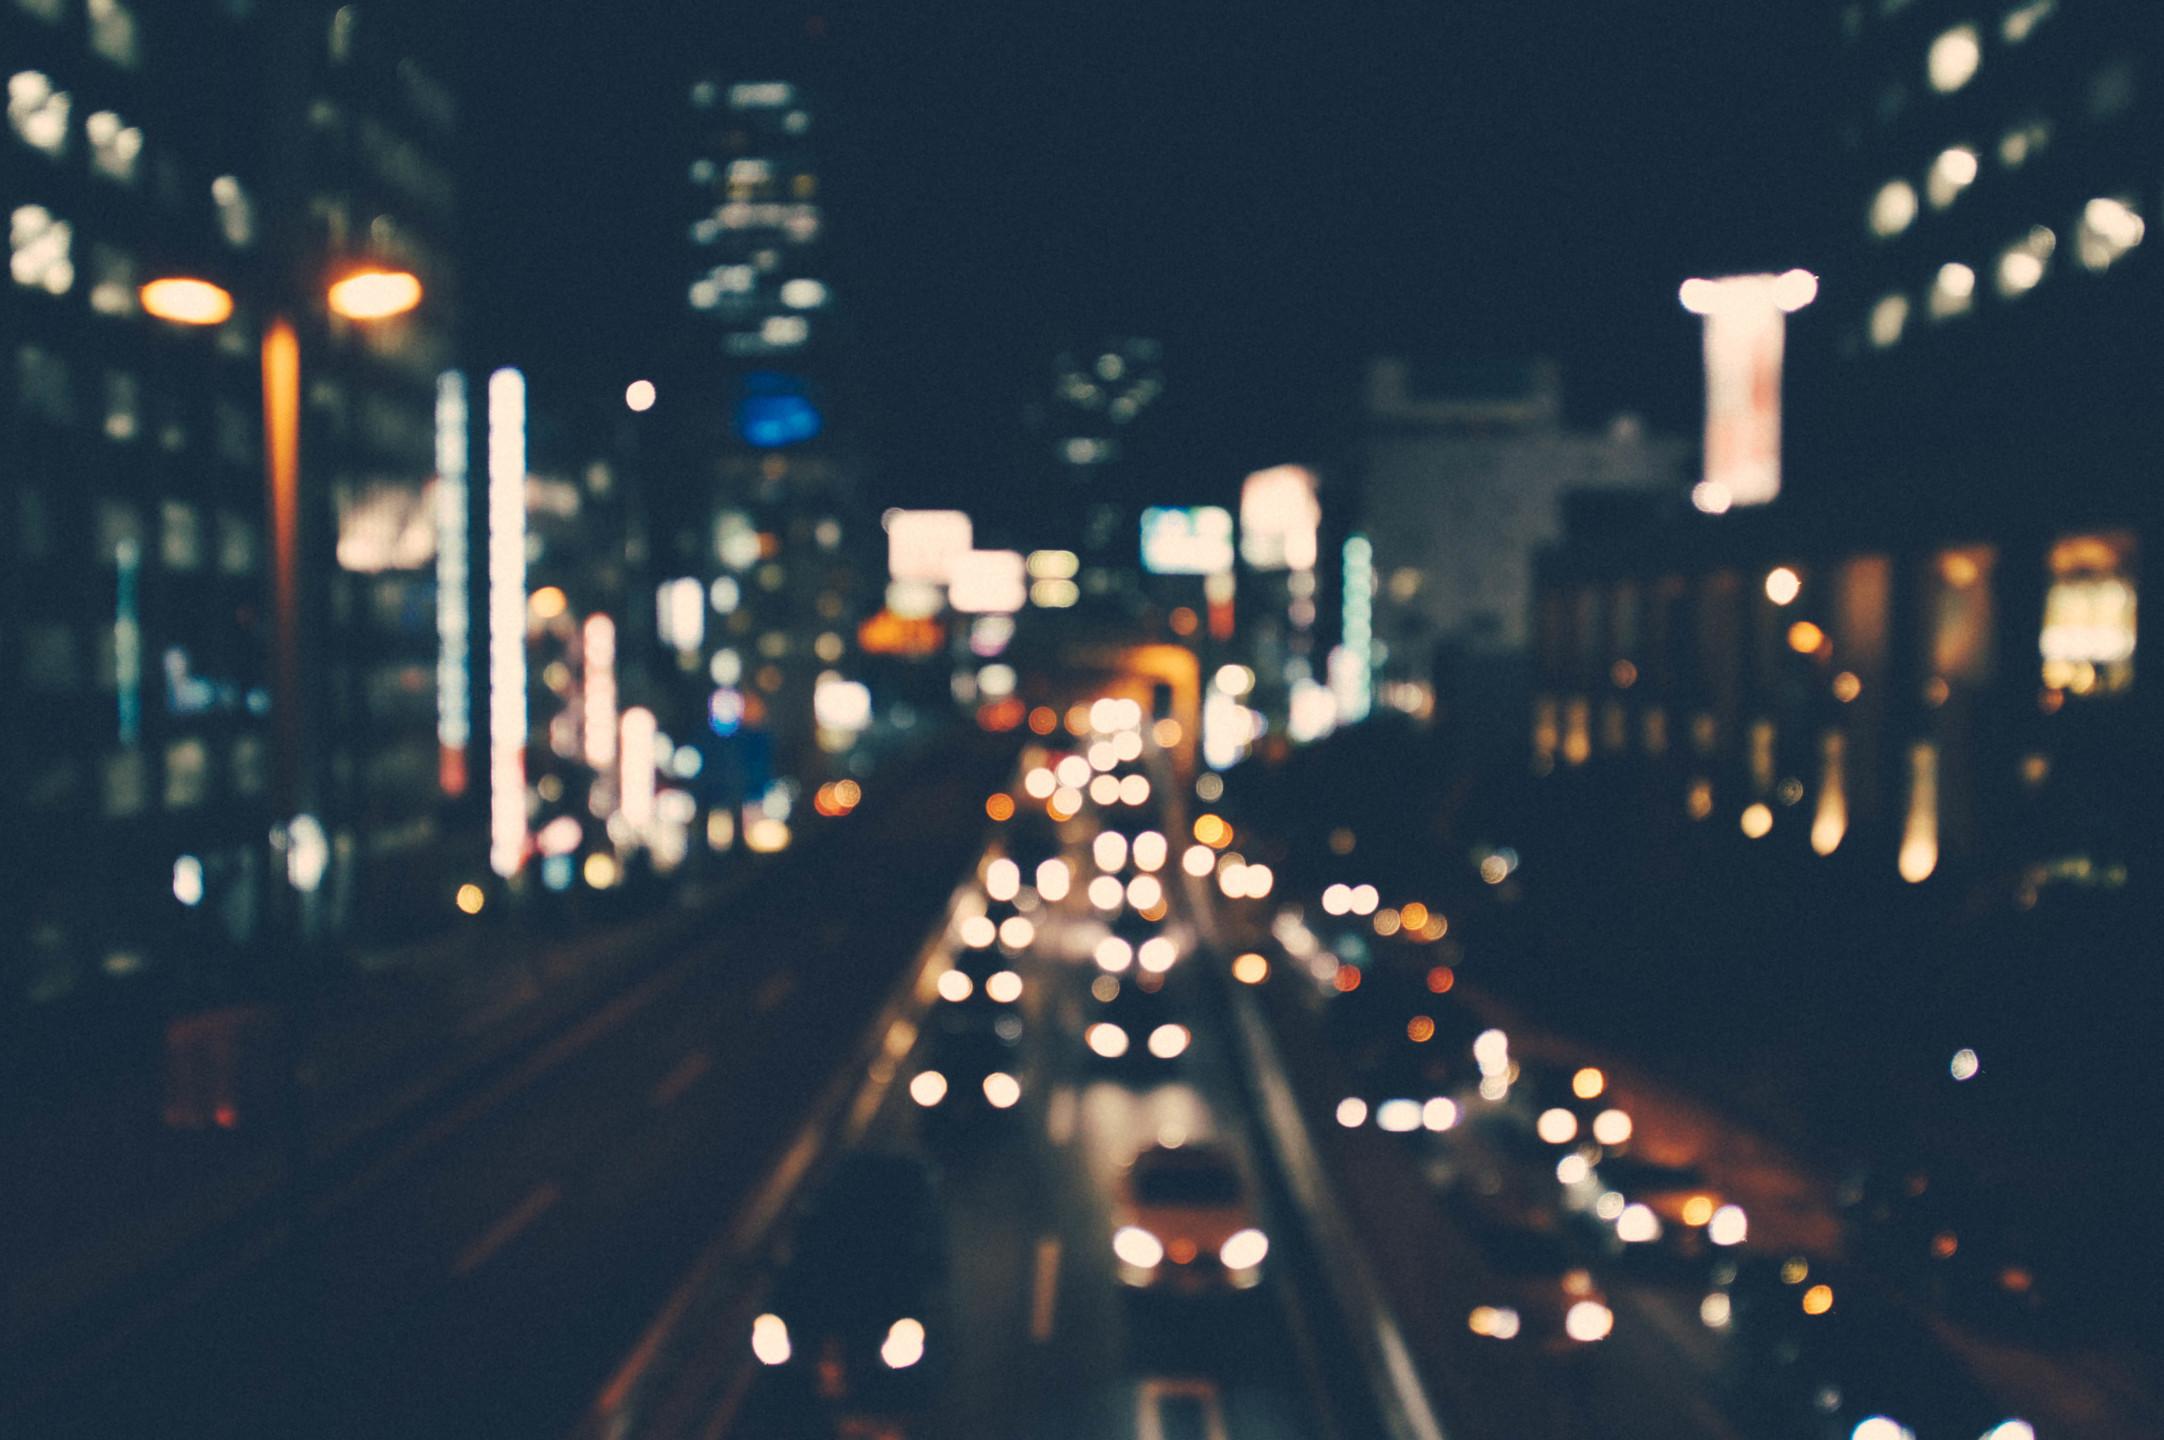 blurredcity.jpeg